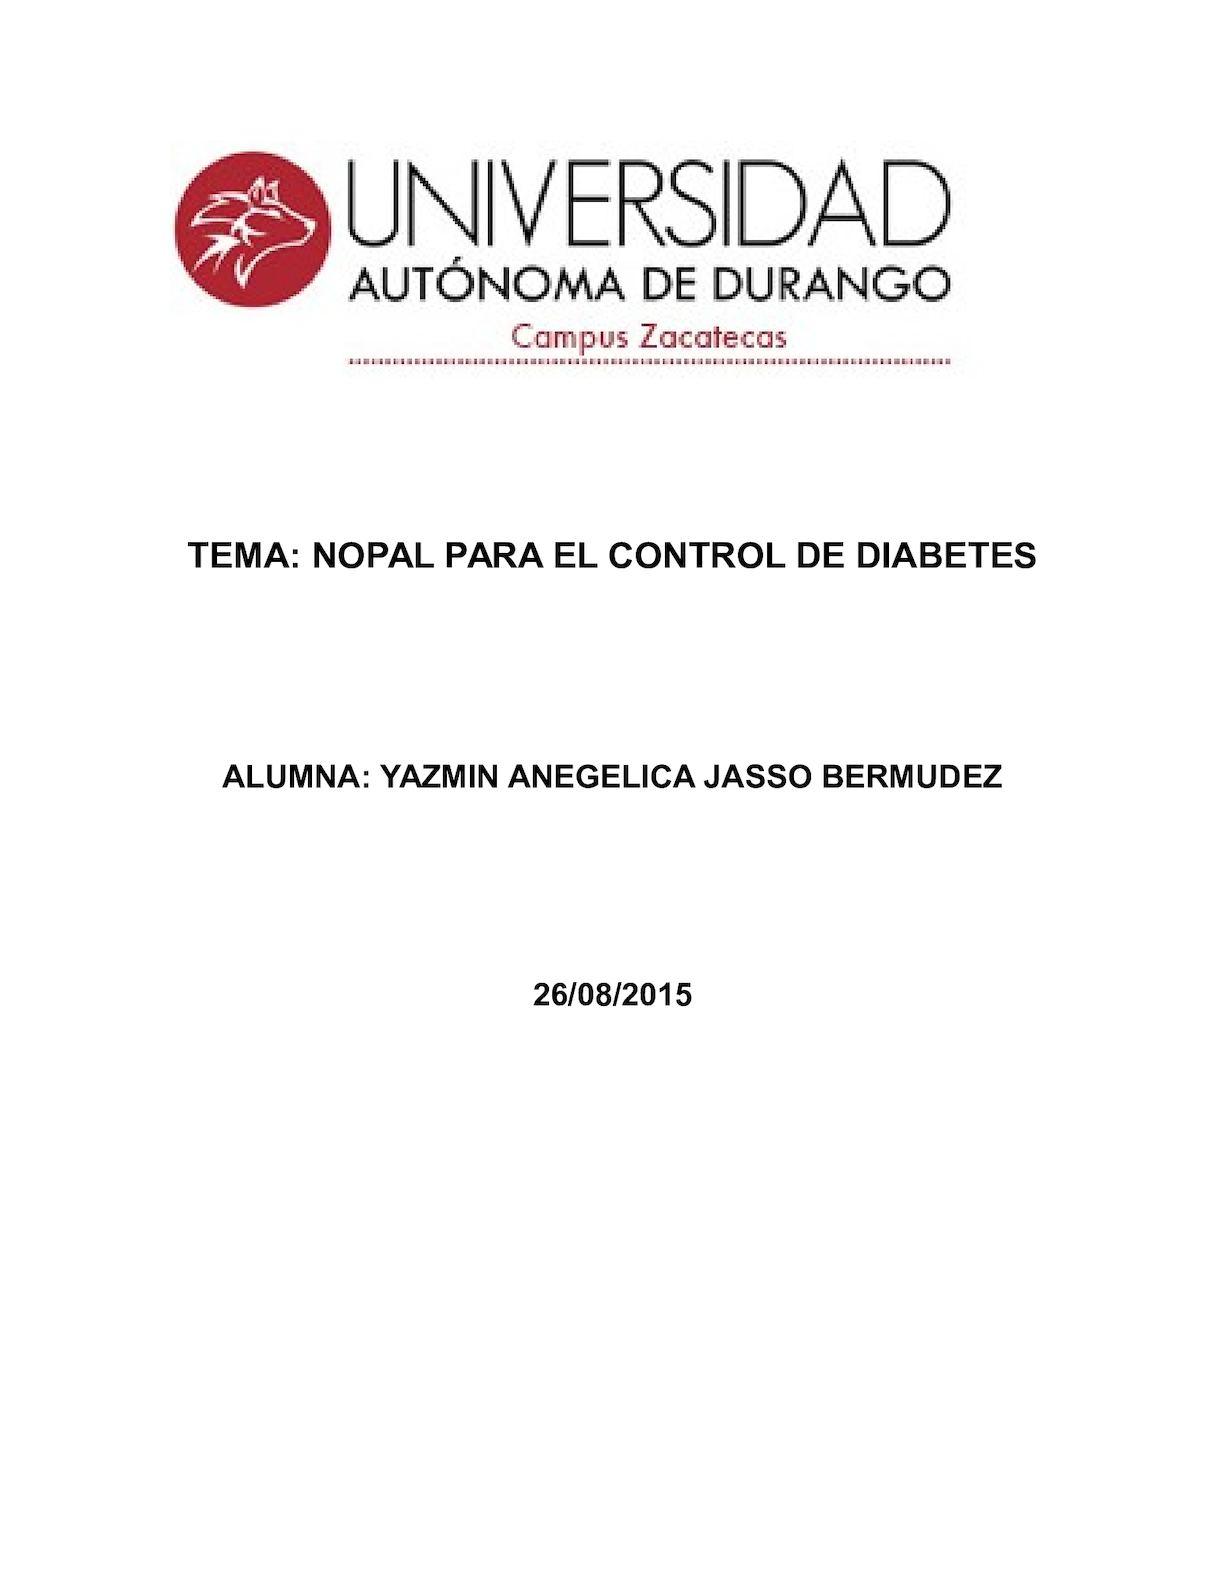 diabetes mellitus tipo 2 imagenes tallos